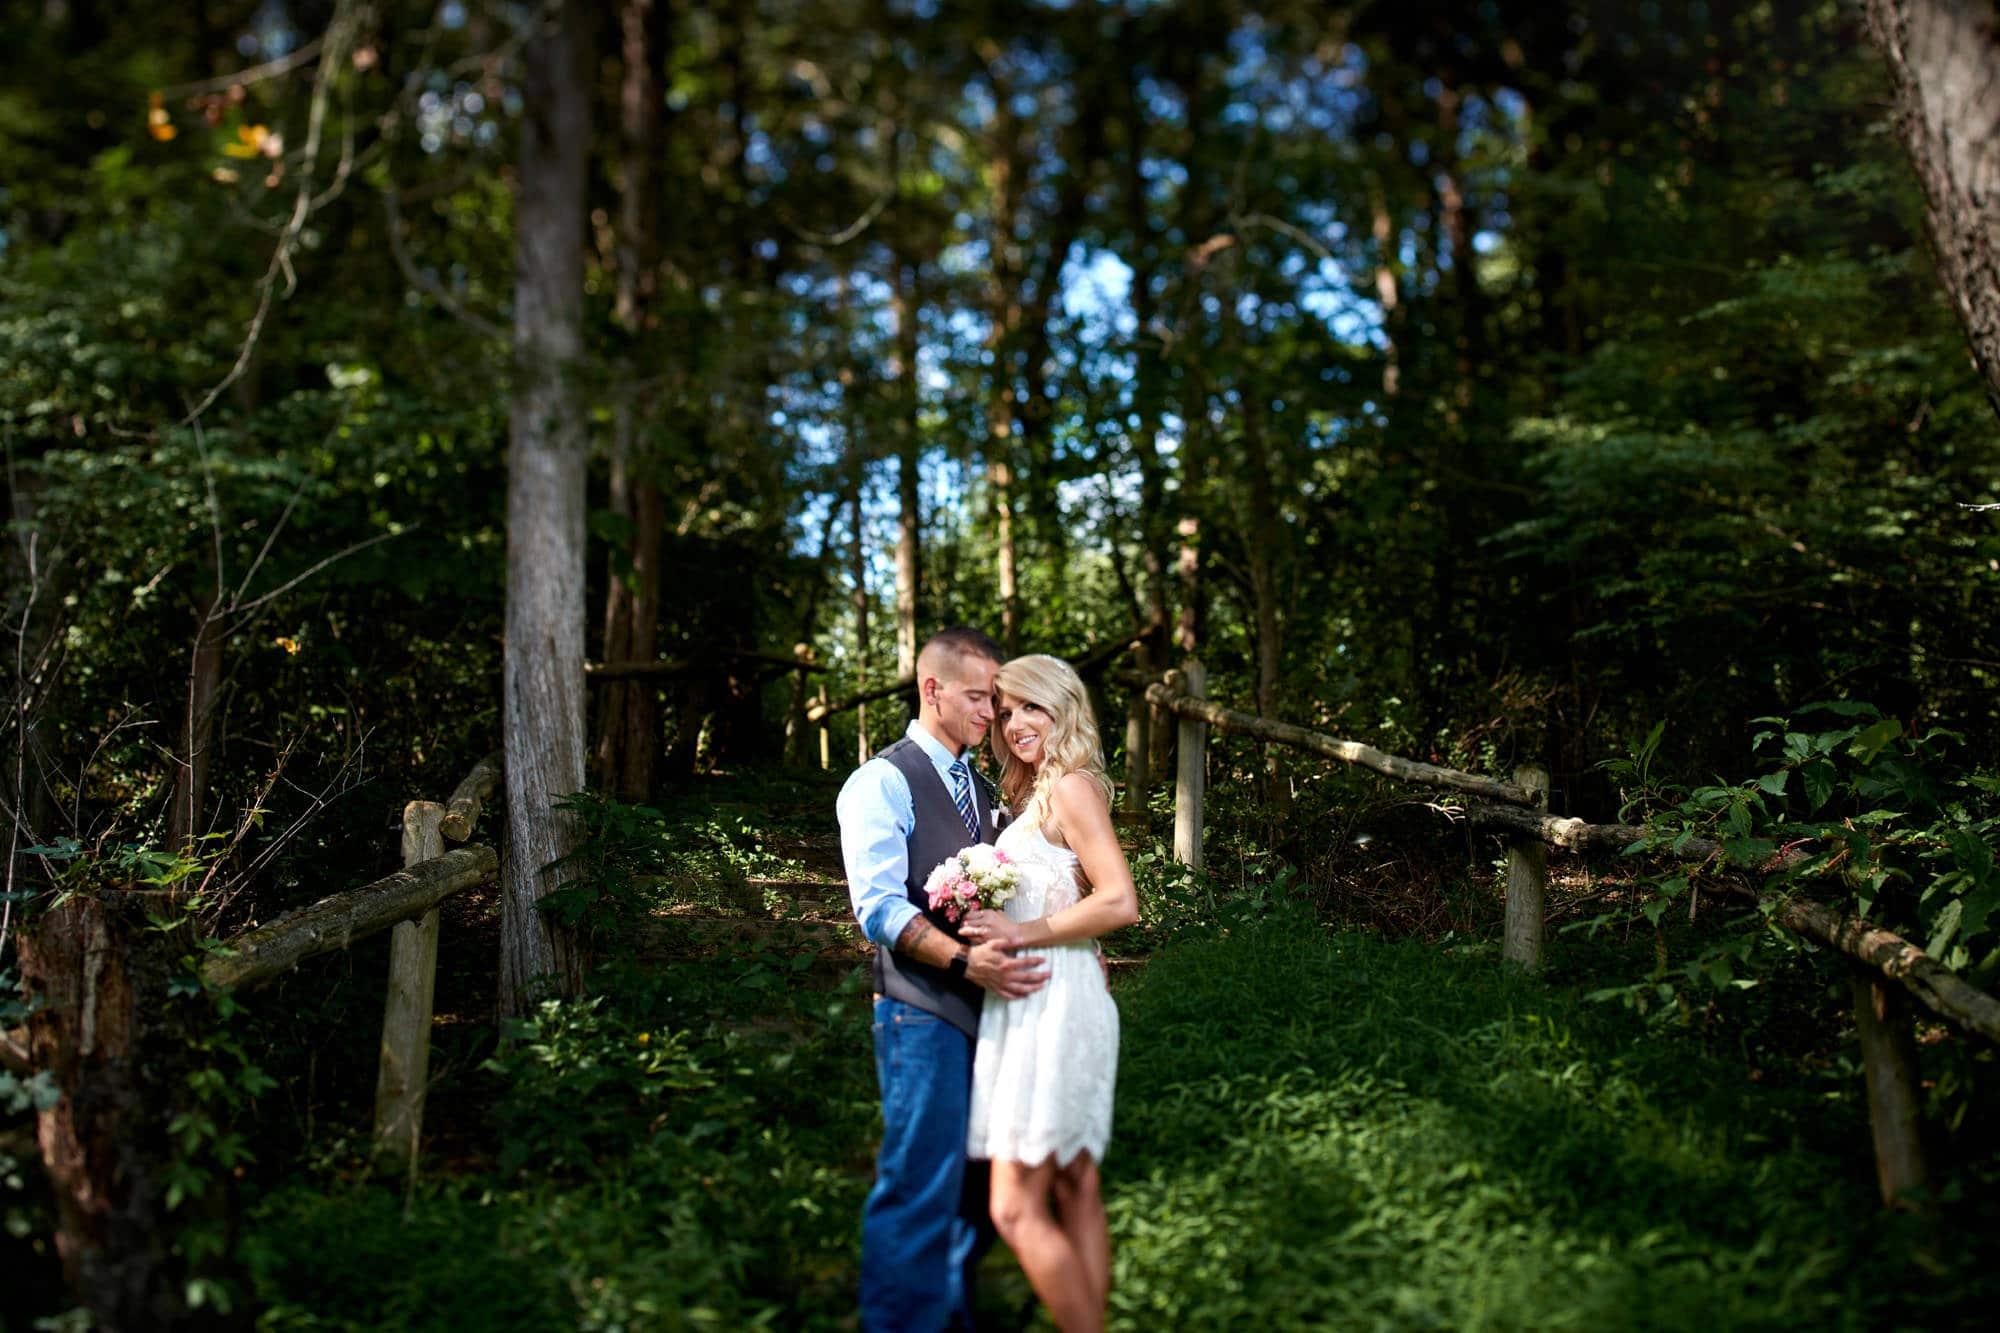 summer elopement wedding photo